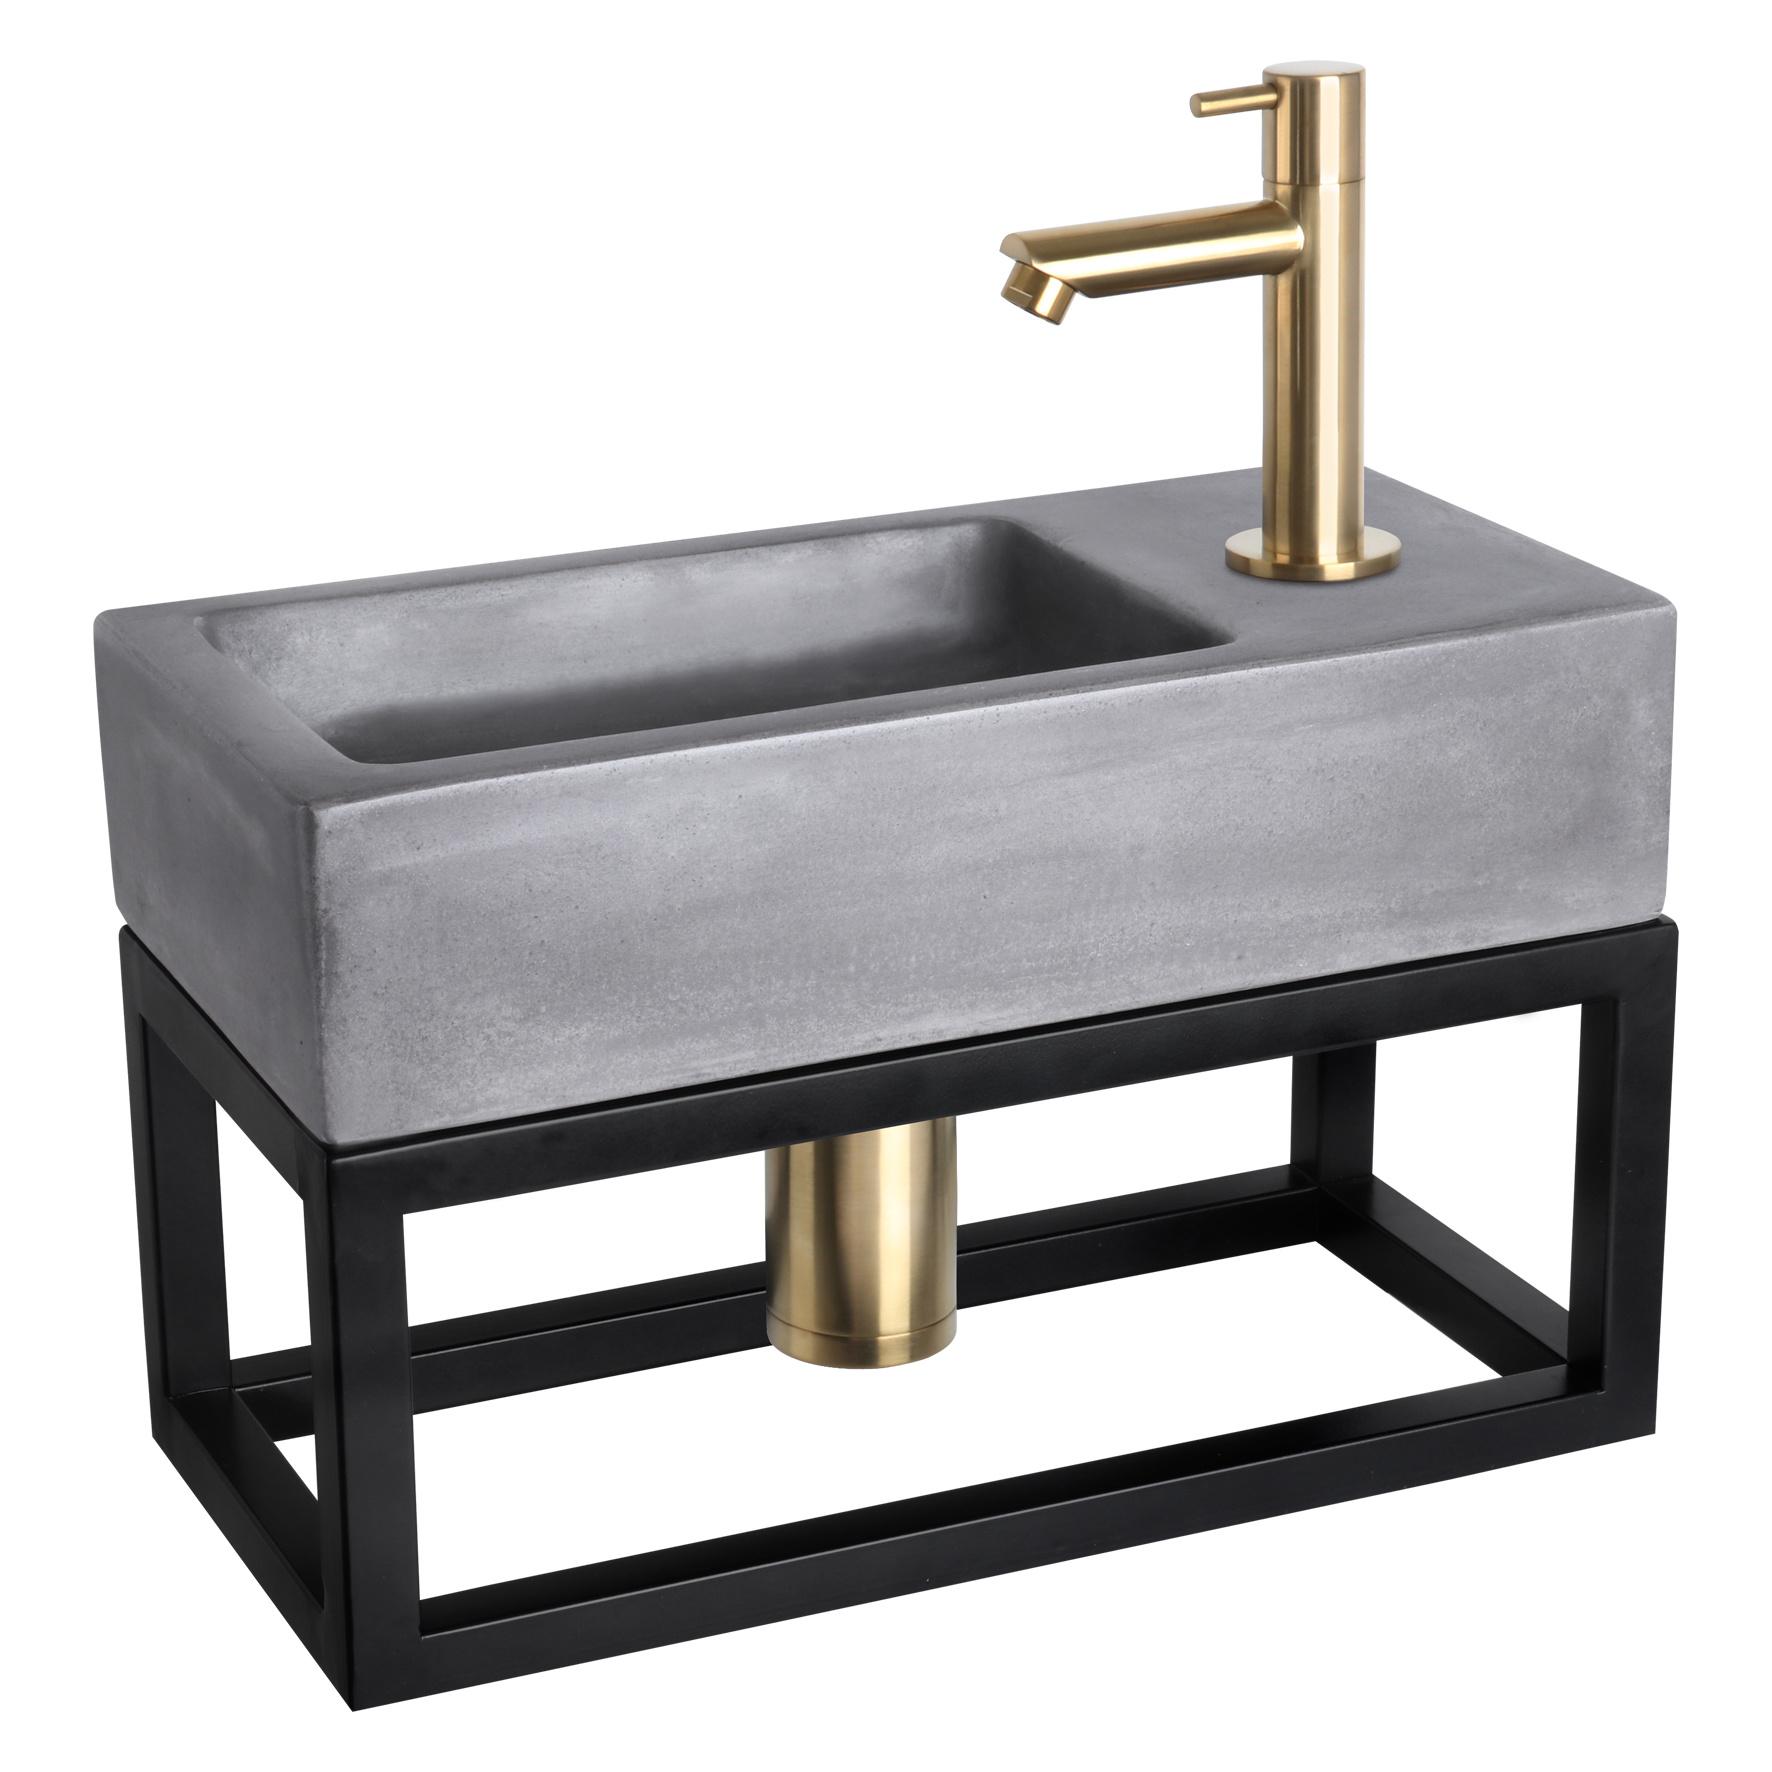 Handdoekrek fontein 38.5 x 18.5 cm Zwart-3